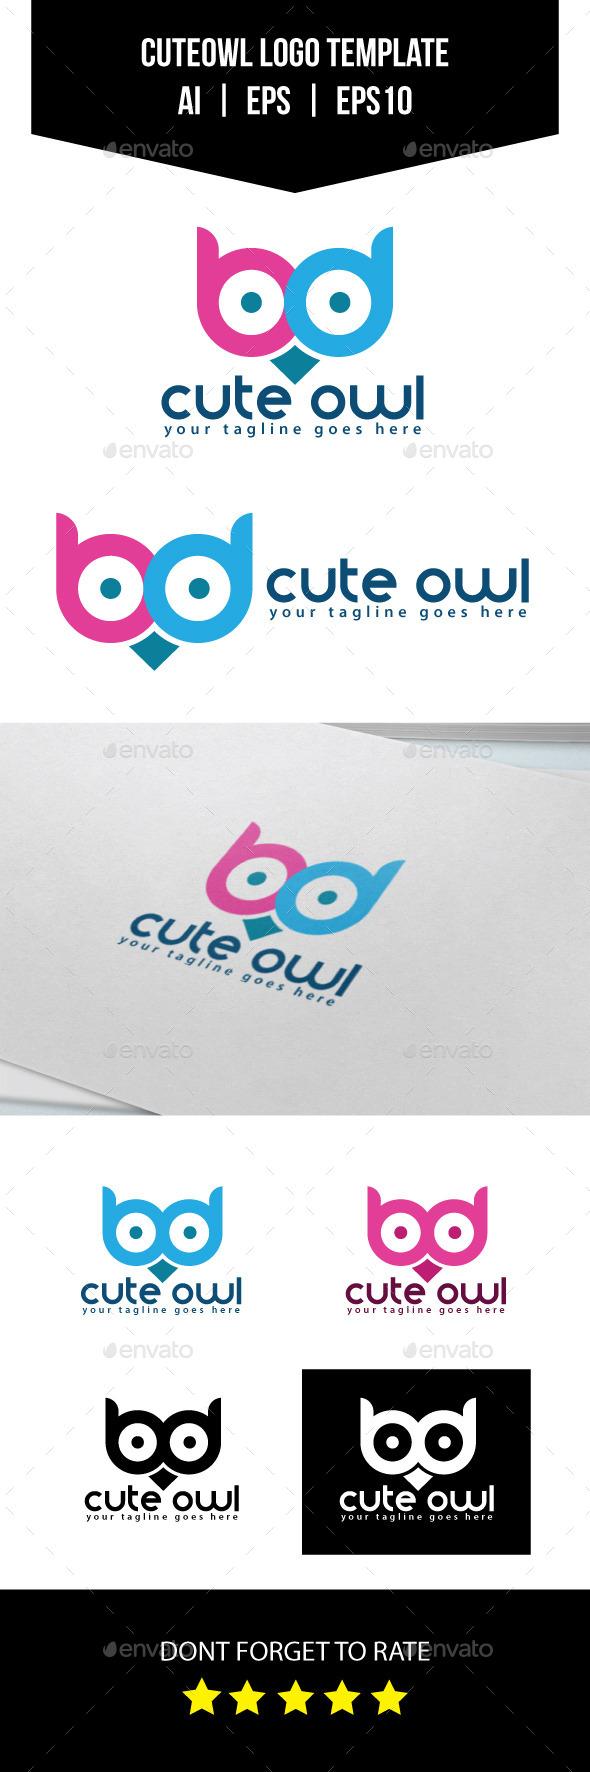 GraphicRiver Cute Owl Logo Template 10935322